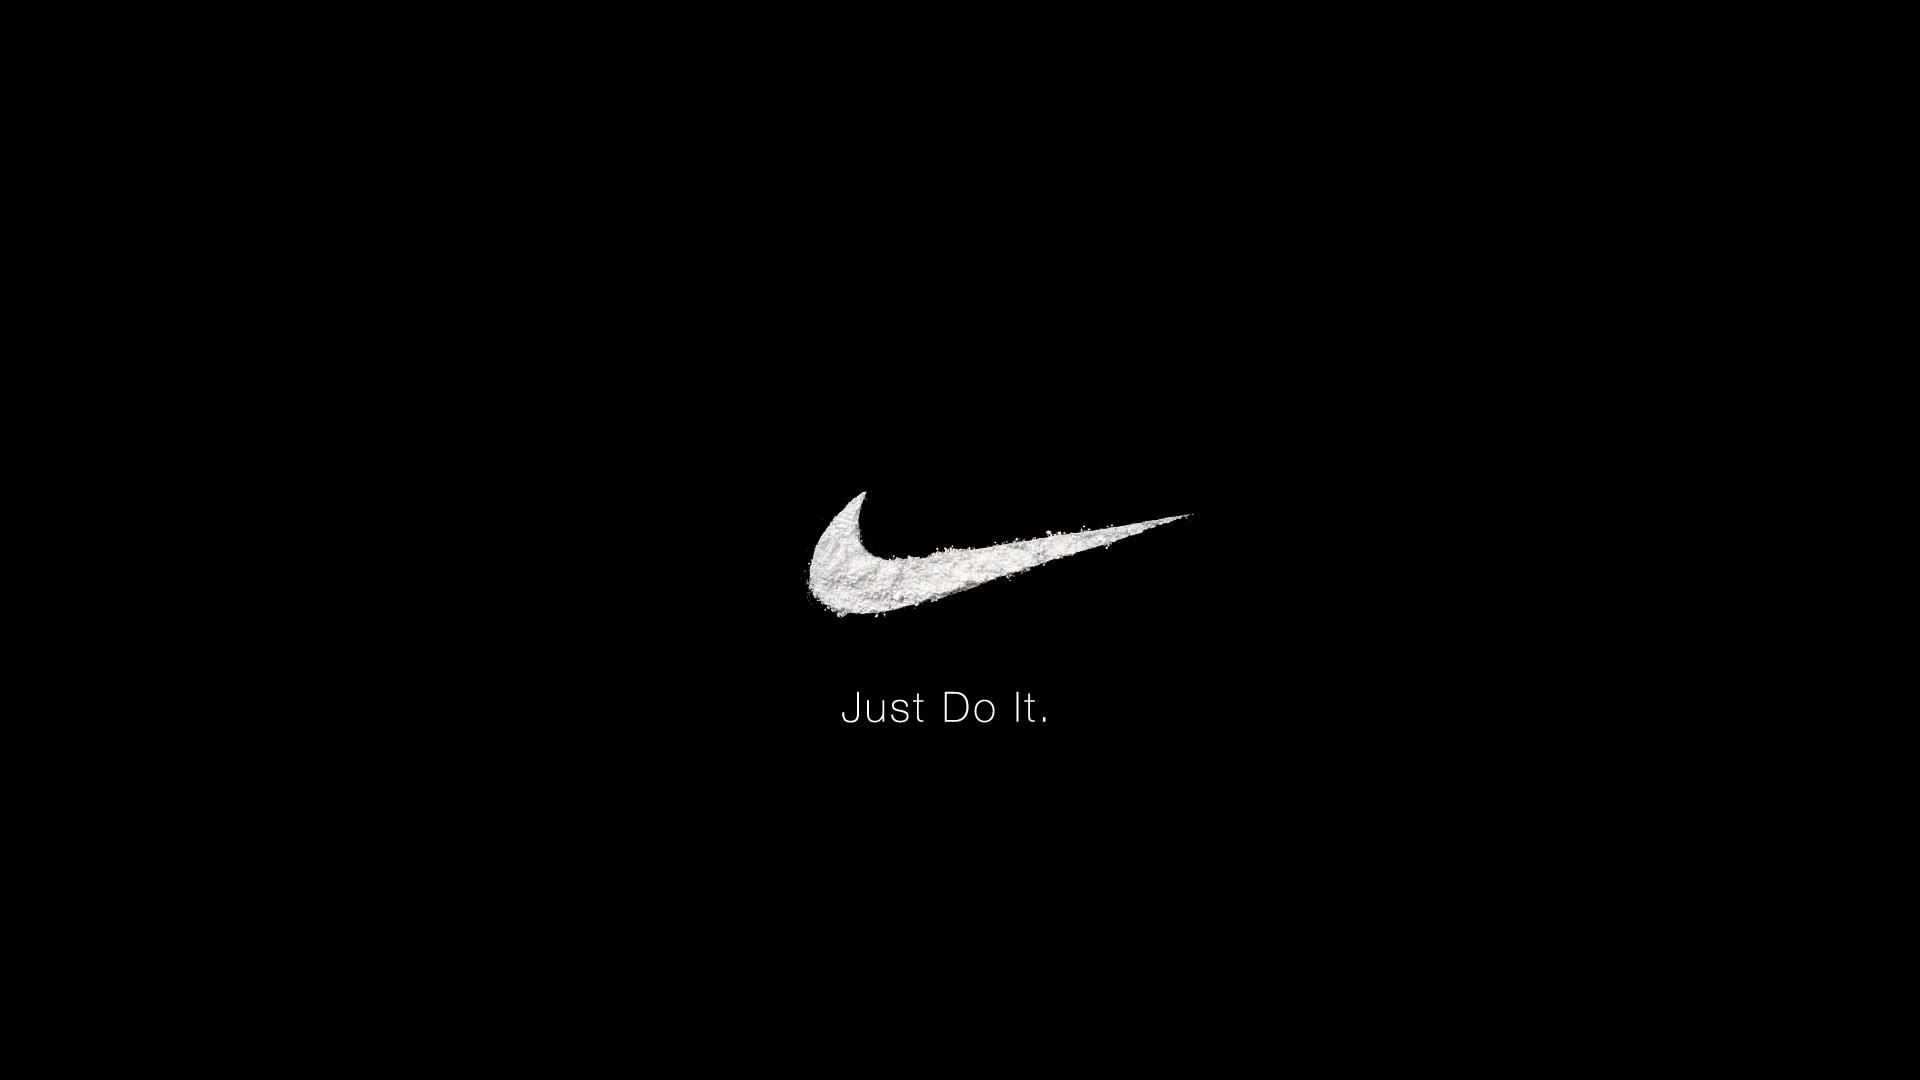 Justice Nike slogan logos Just do it wallpaper 1920x1080 216738 1920x1080